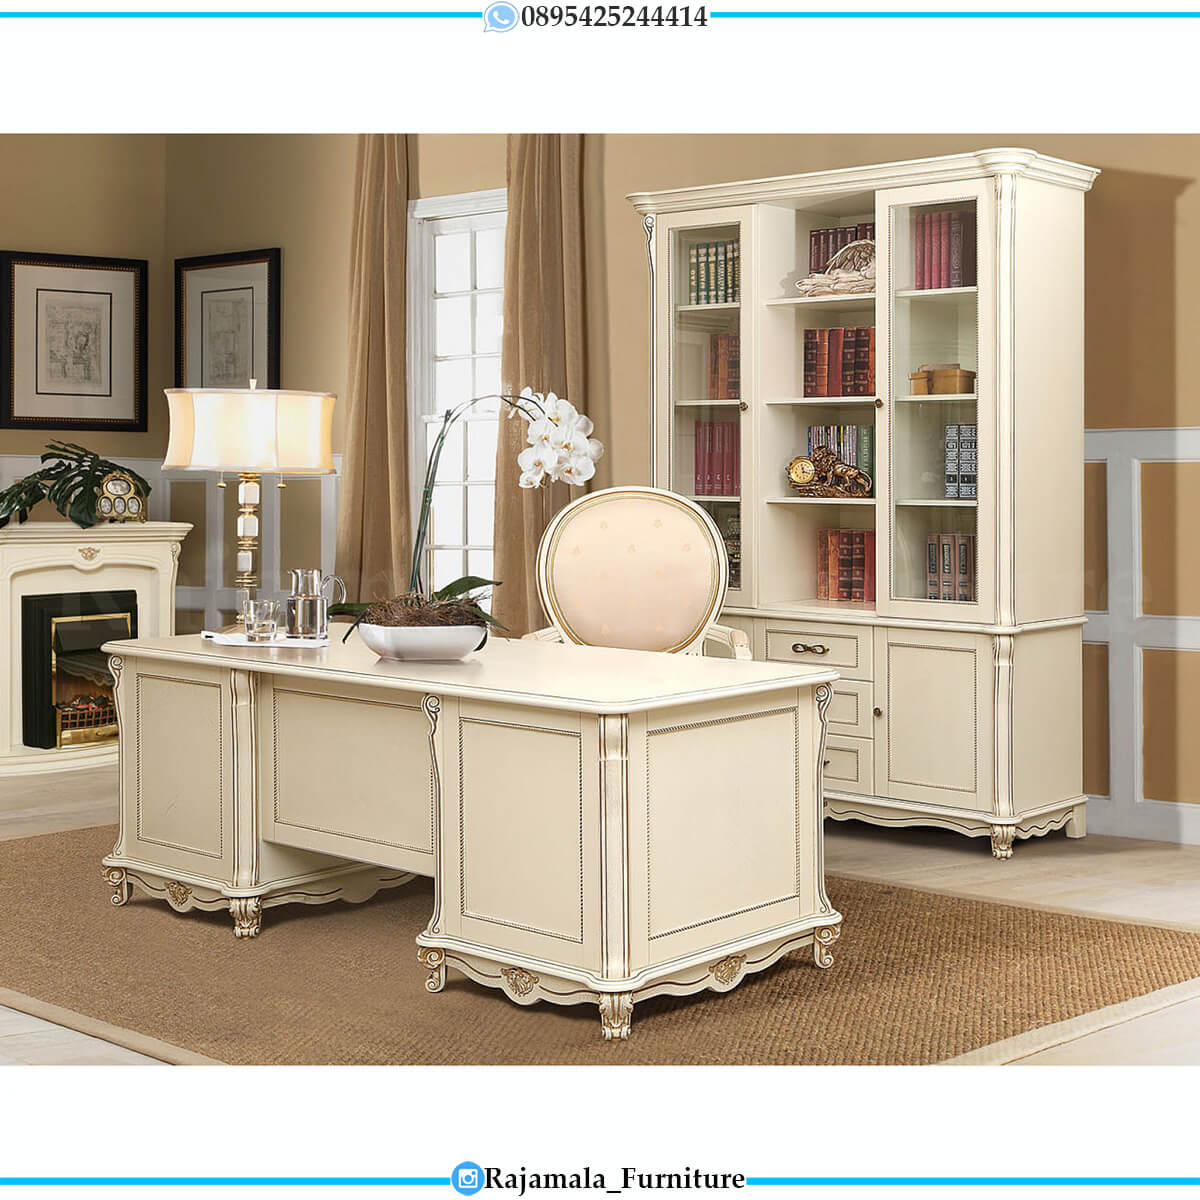 Beauty Meja Kerja Minimalis Putih Luxury Classic Mebel Jepara RM-0579